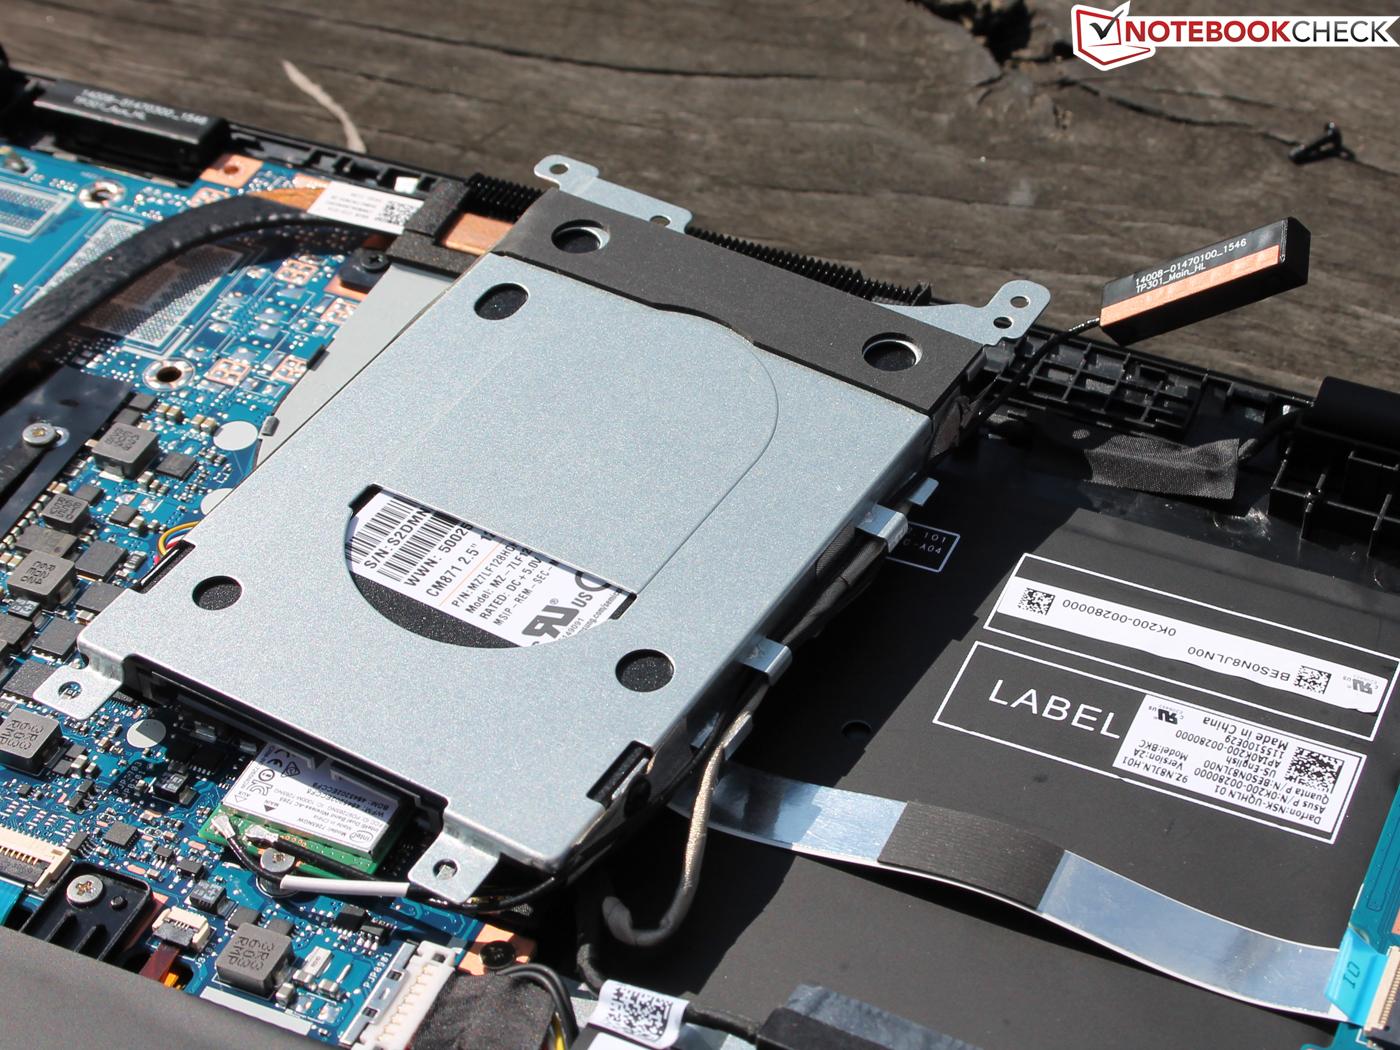 Asus VivoBook Flip TP301UA-DW006T Convertible Review - NotebookCheck